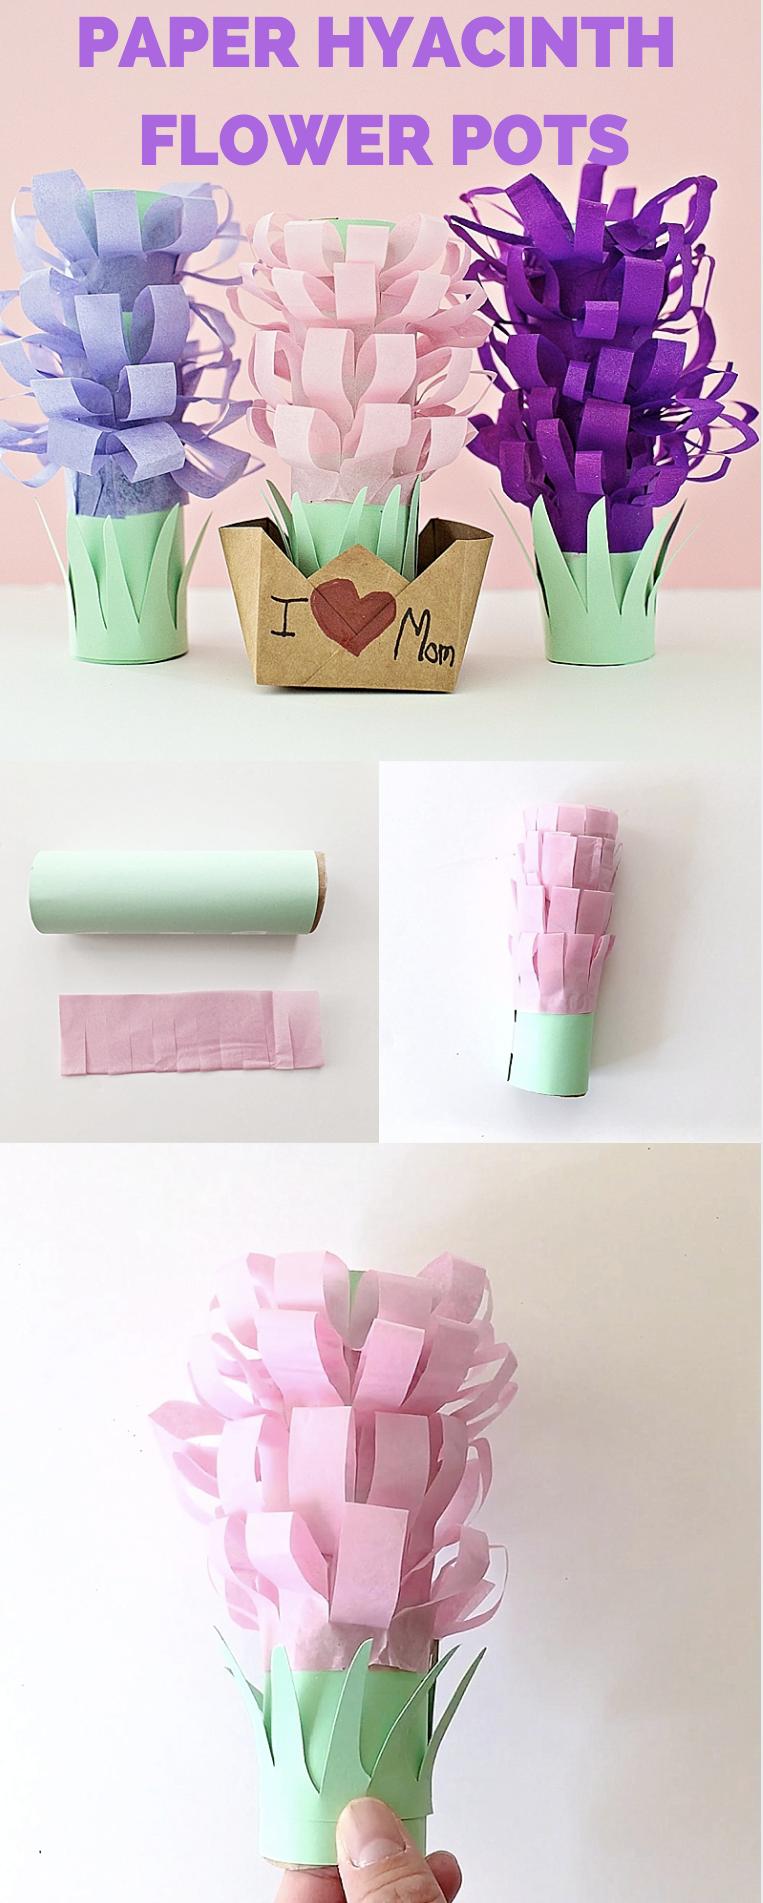 Paper tissue hyacinth flower pots papercraft flower and spring flower crafts paper tissue hyacinth flower pots mightylinksfo